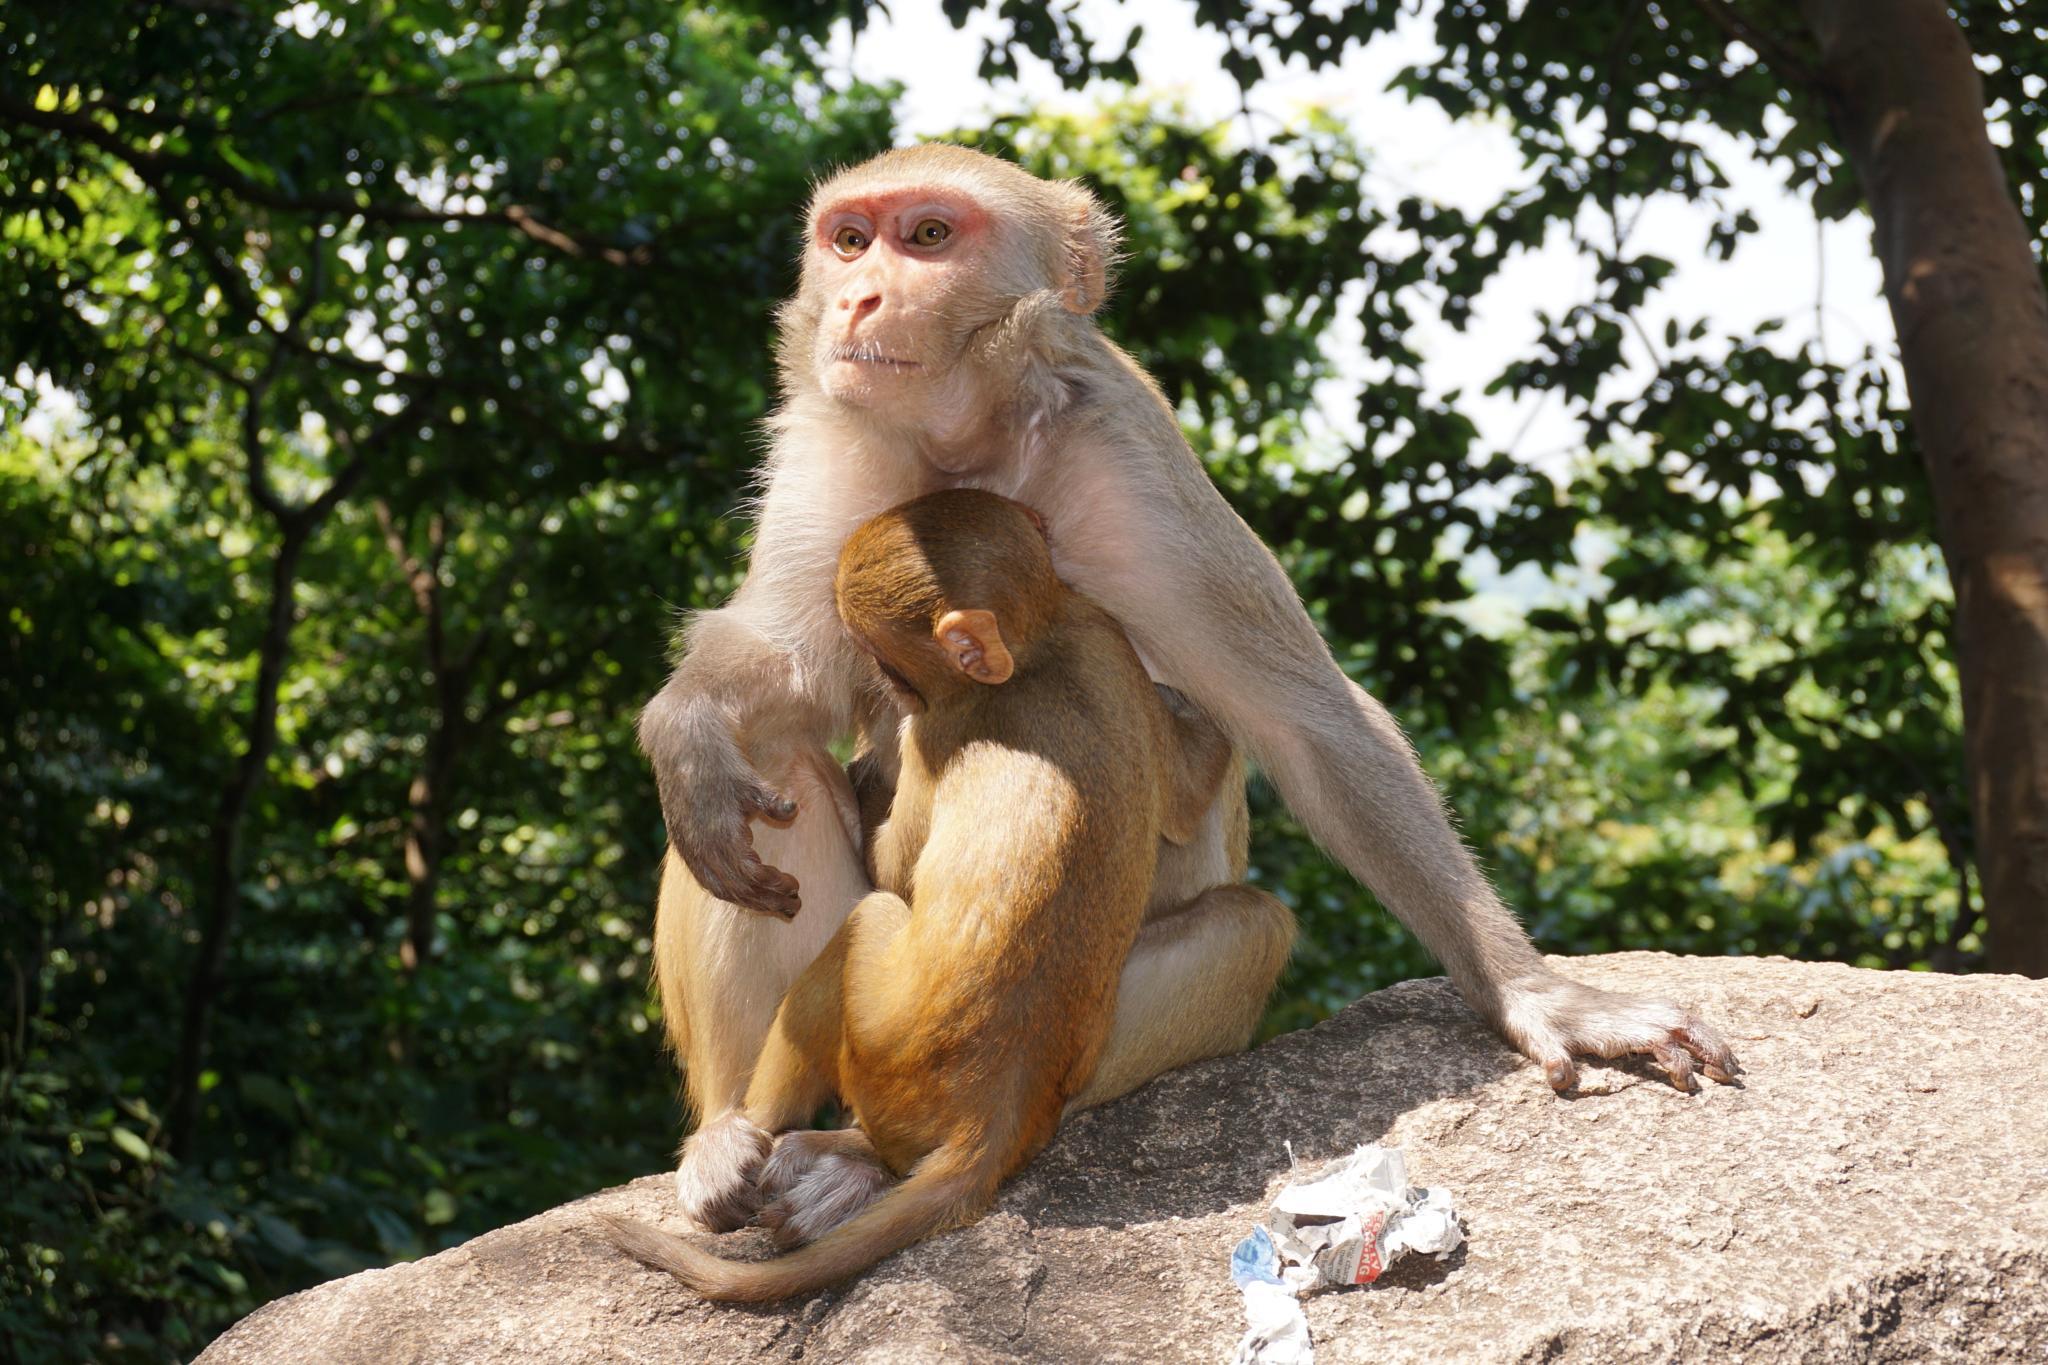 Monkey at Trikut Hill by Palash Naskar